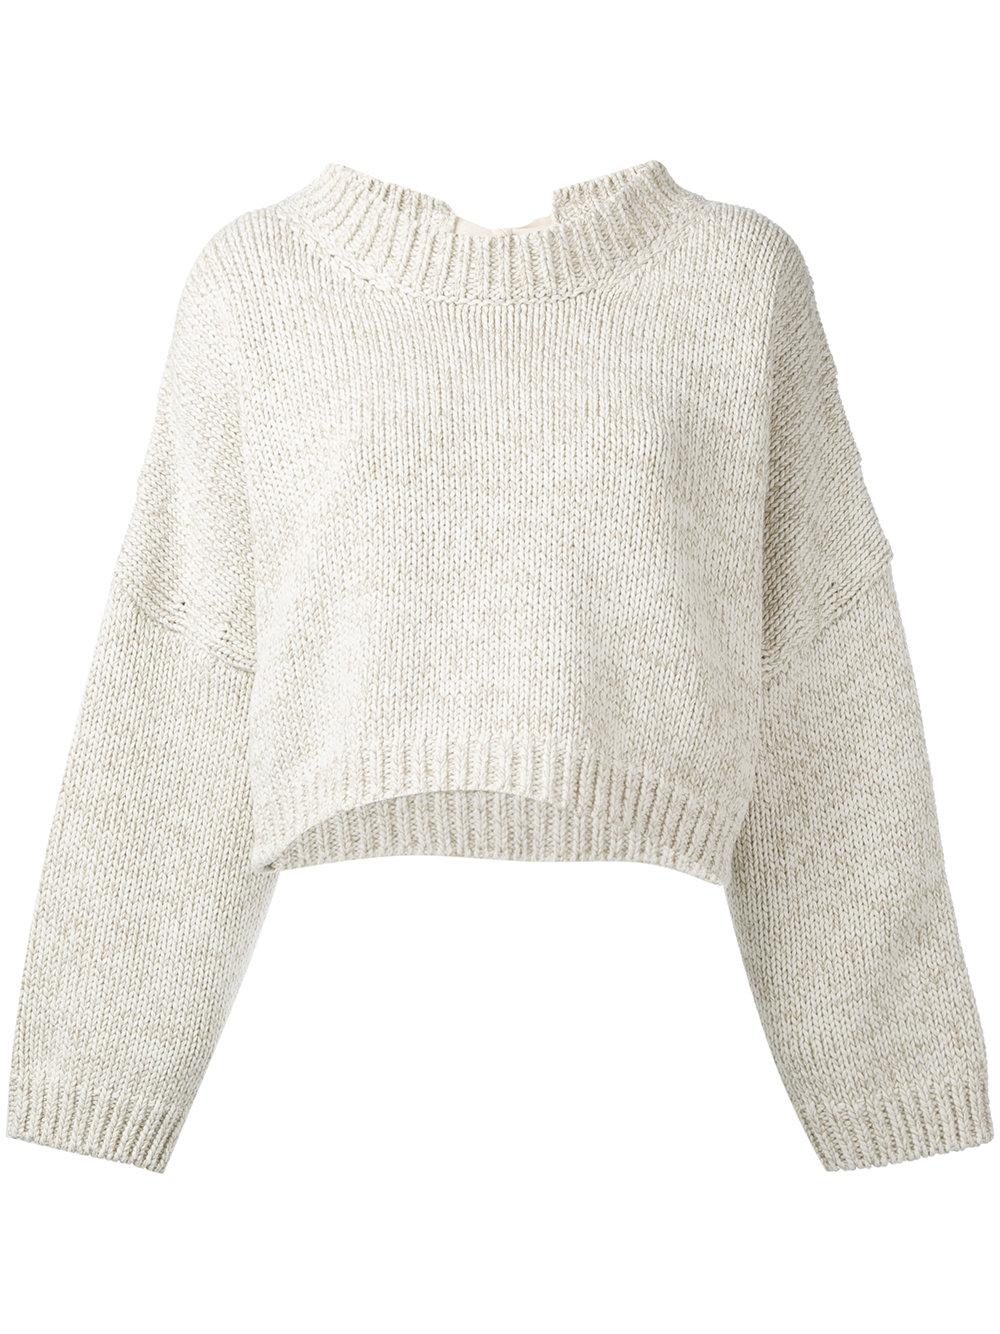 J.W. Anderson Sweater